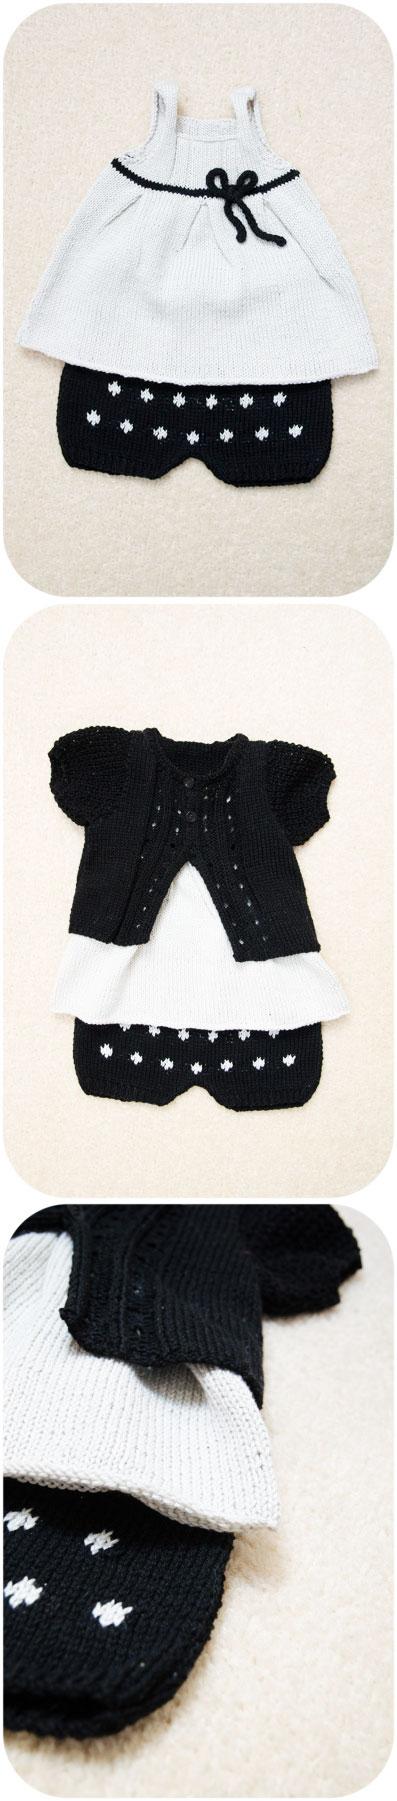 tricots-patricia